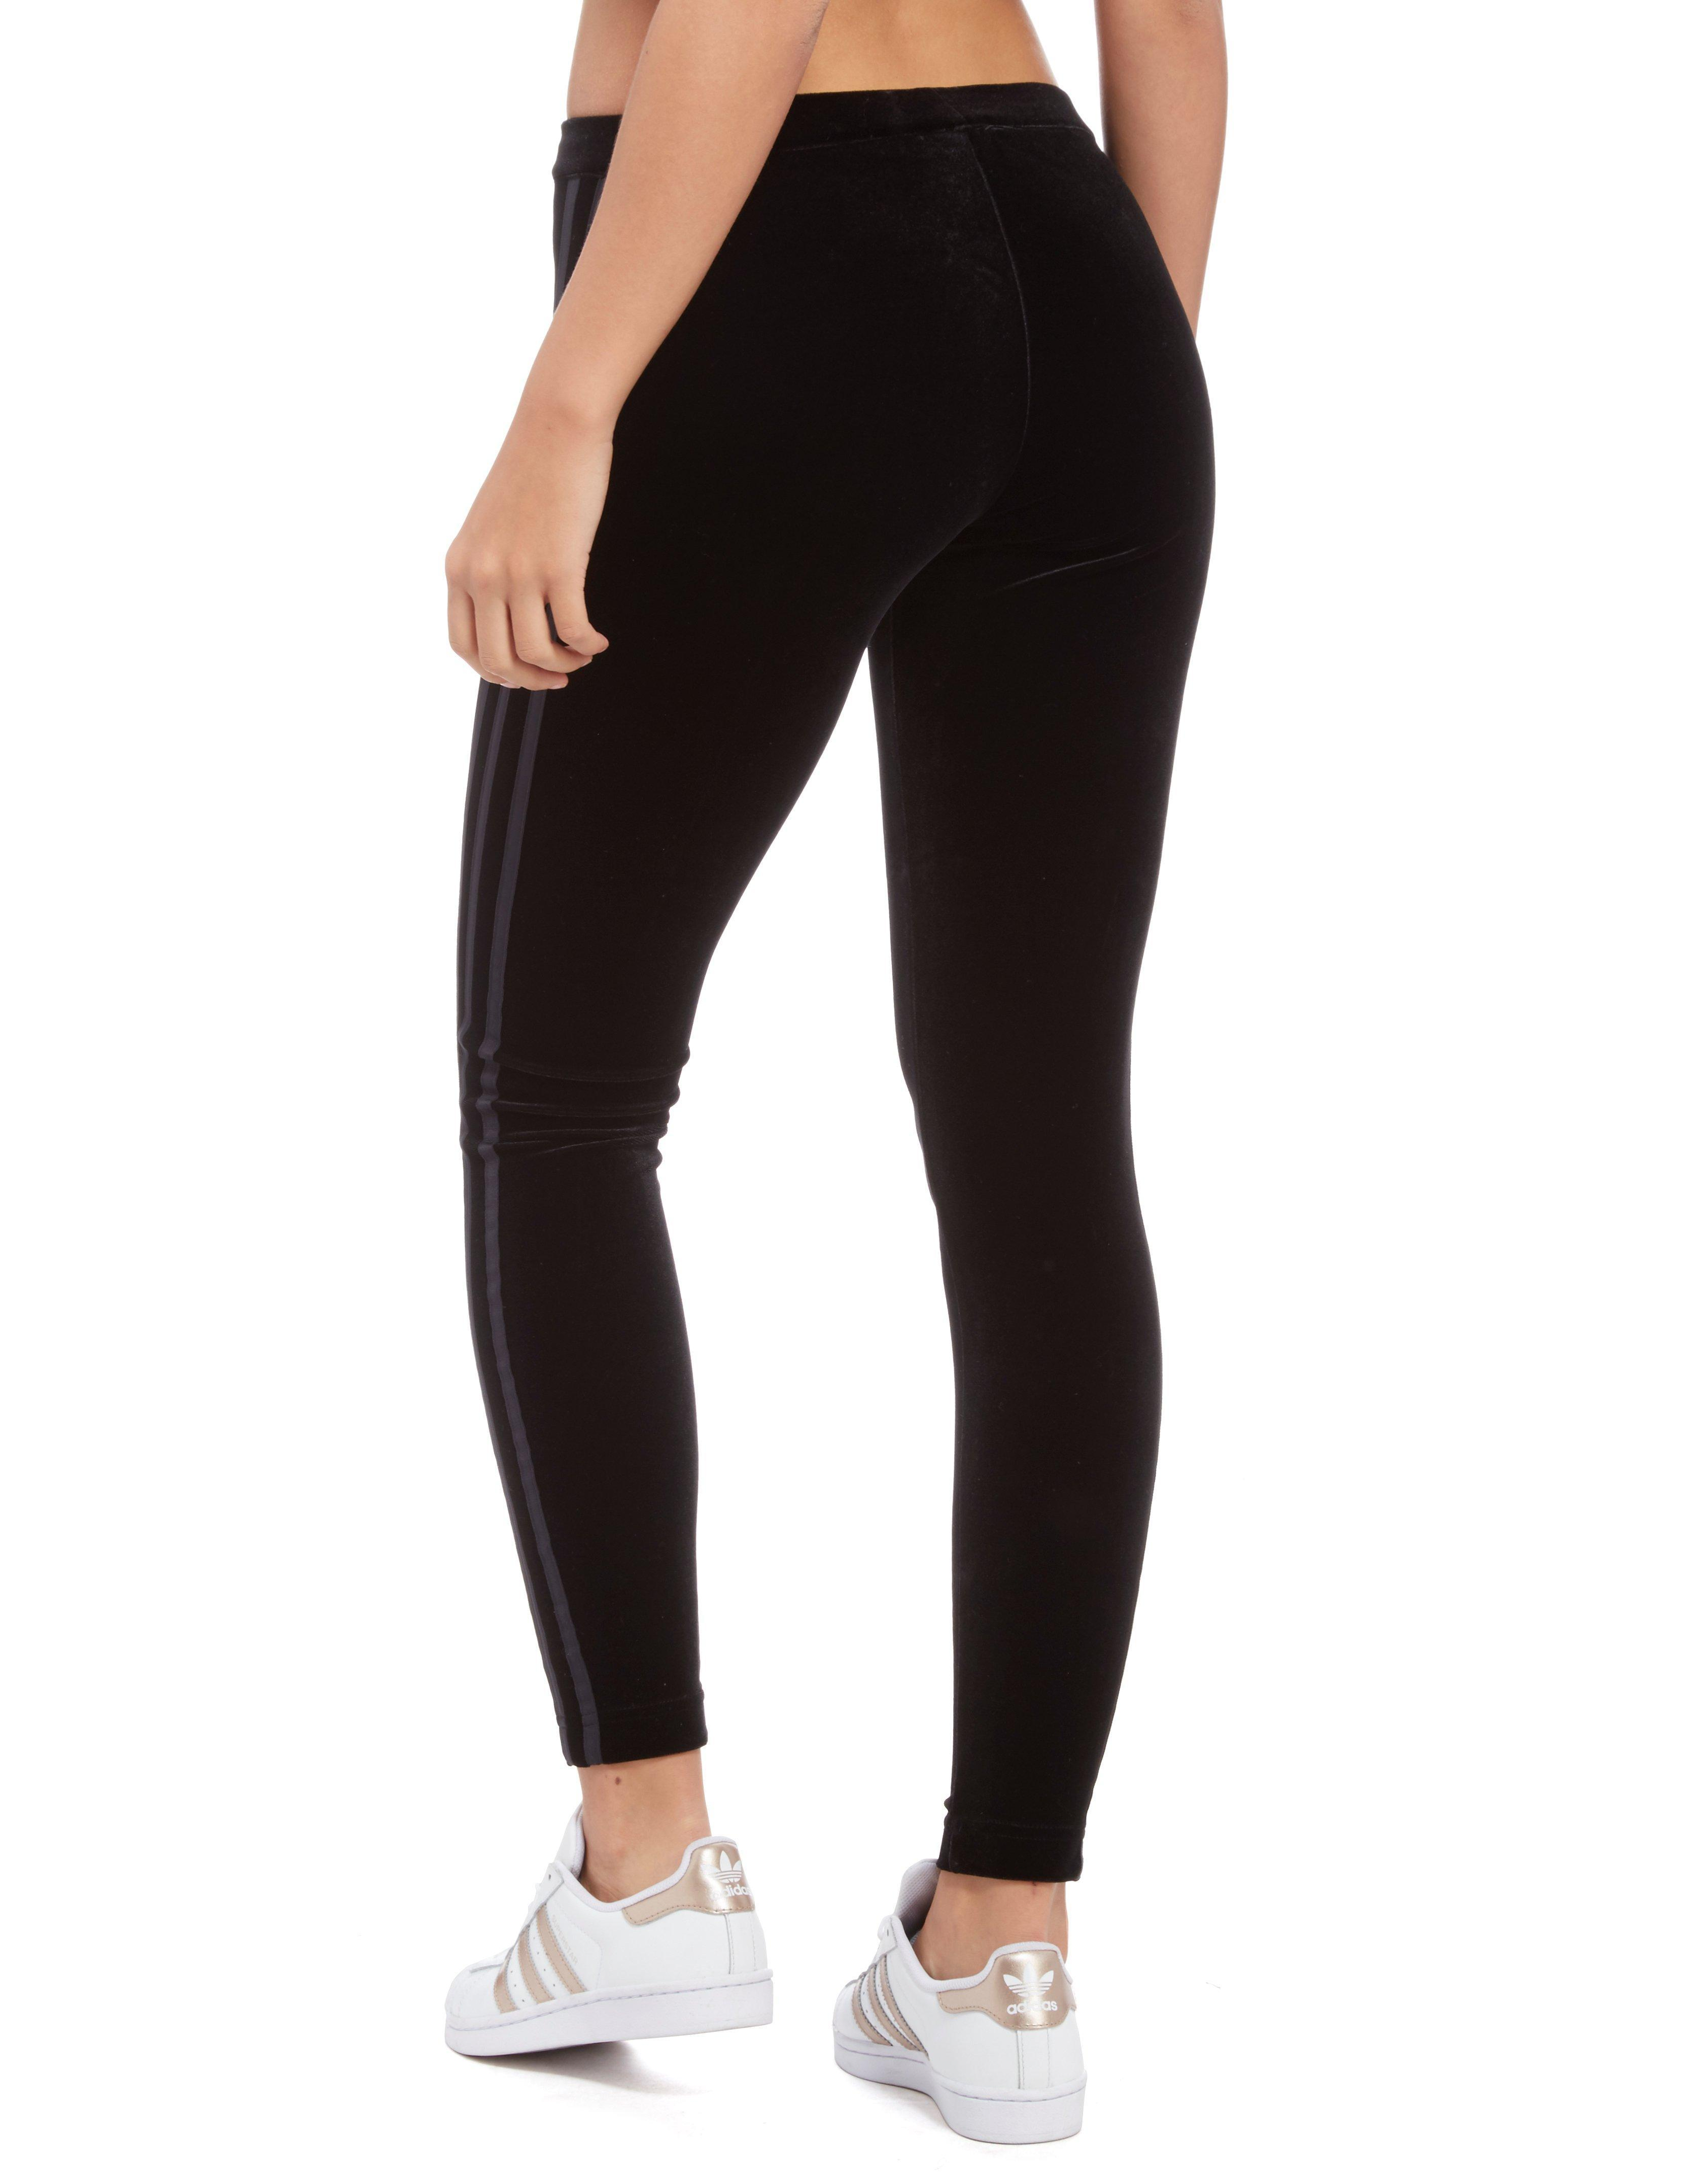 new product 335f4 234fb Lyst - adidas Originals 3-stripes Trefoil Velvet Leggings in Black